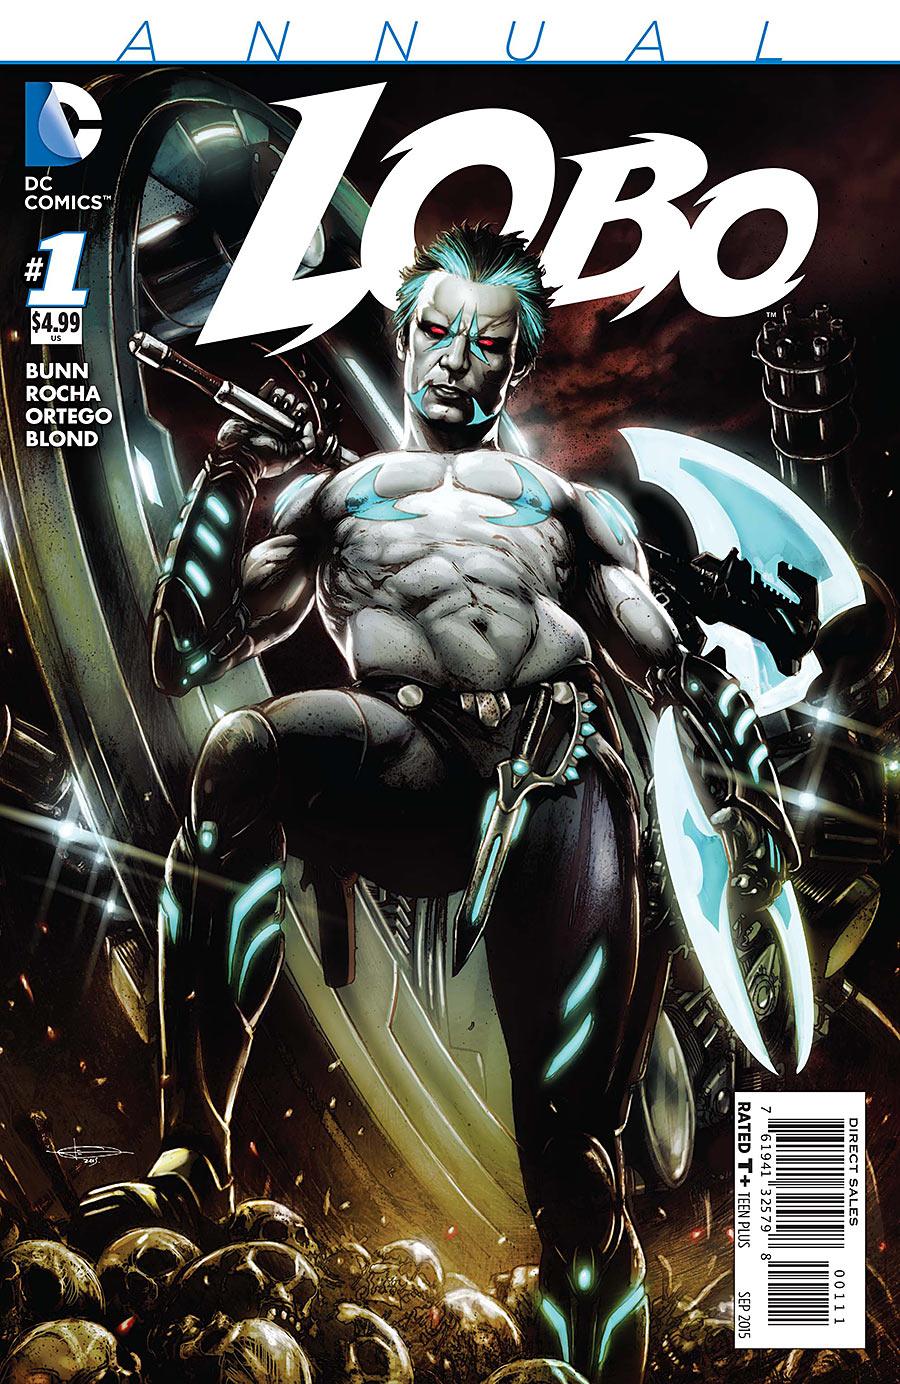 Leer Lobo Volumen 3 Online en Español